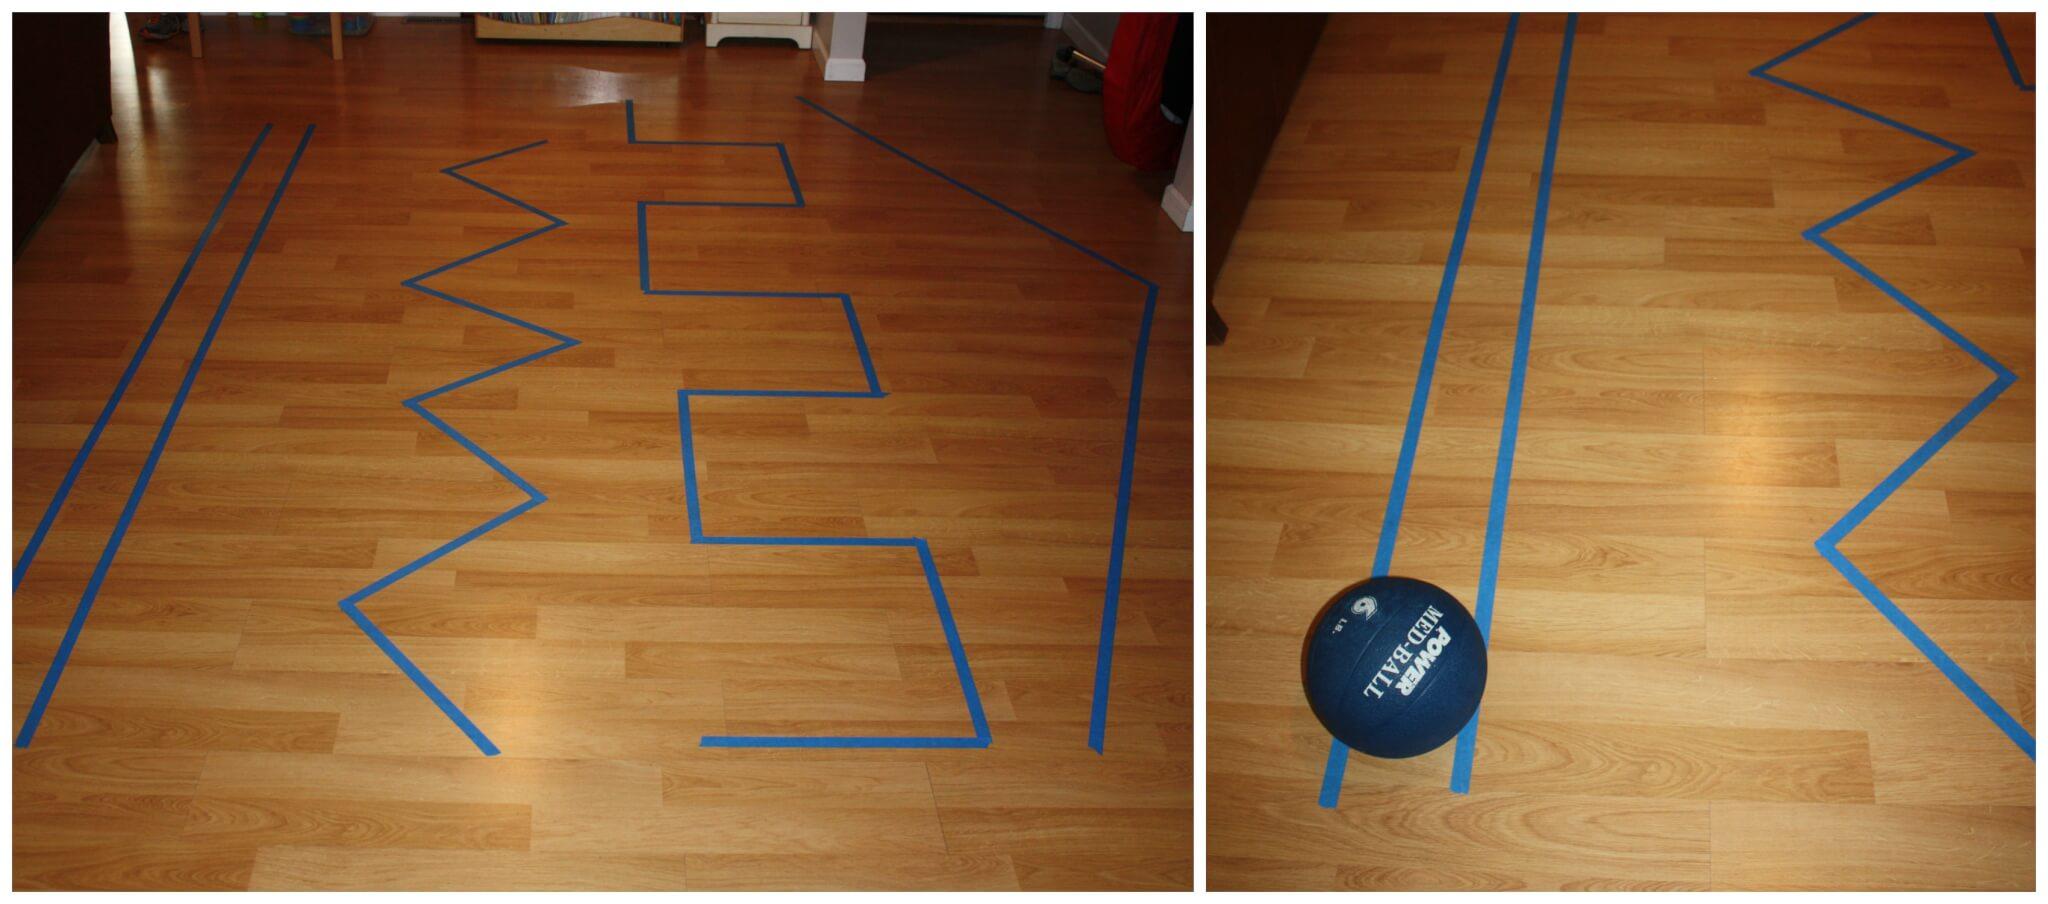 The easy-to-grasp Sensory Discover and Play Sensory Ball Fun Activity!